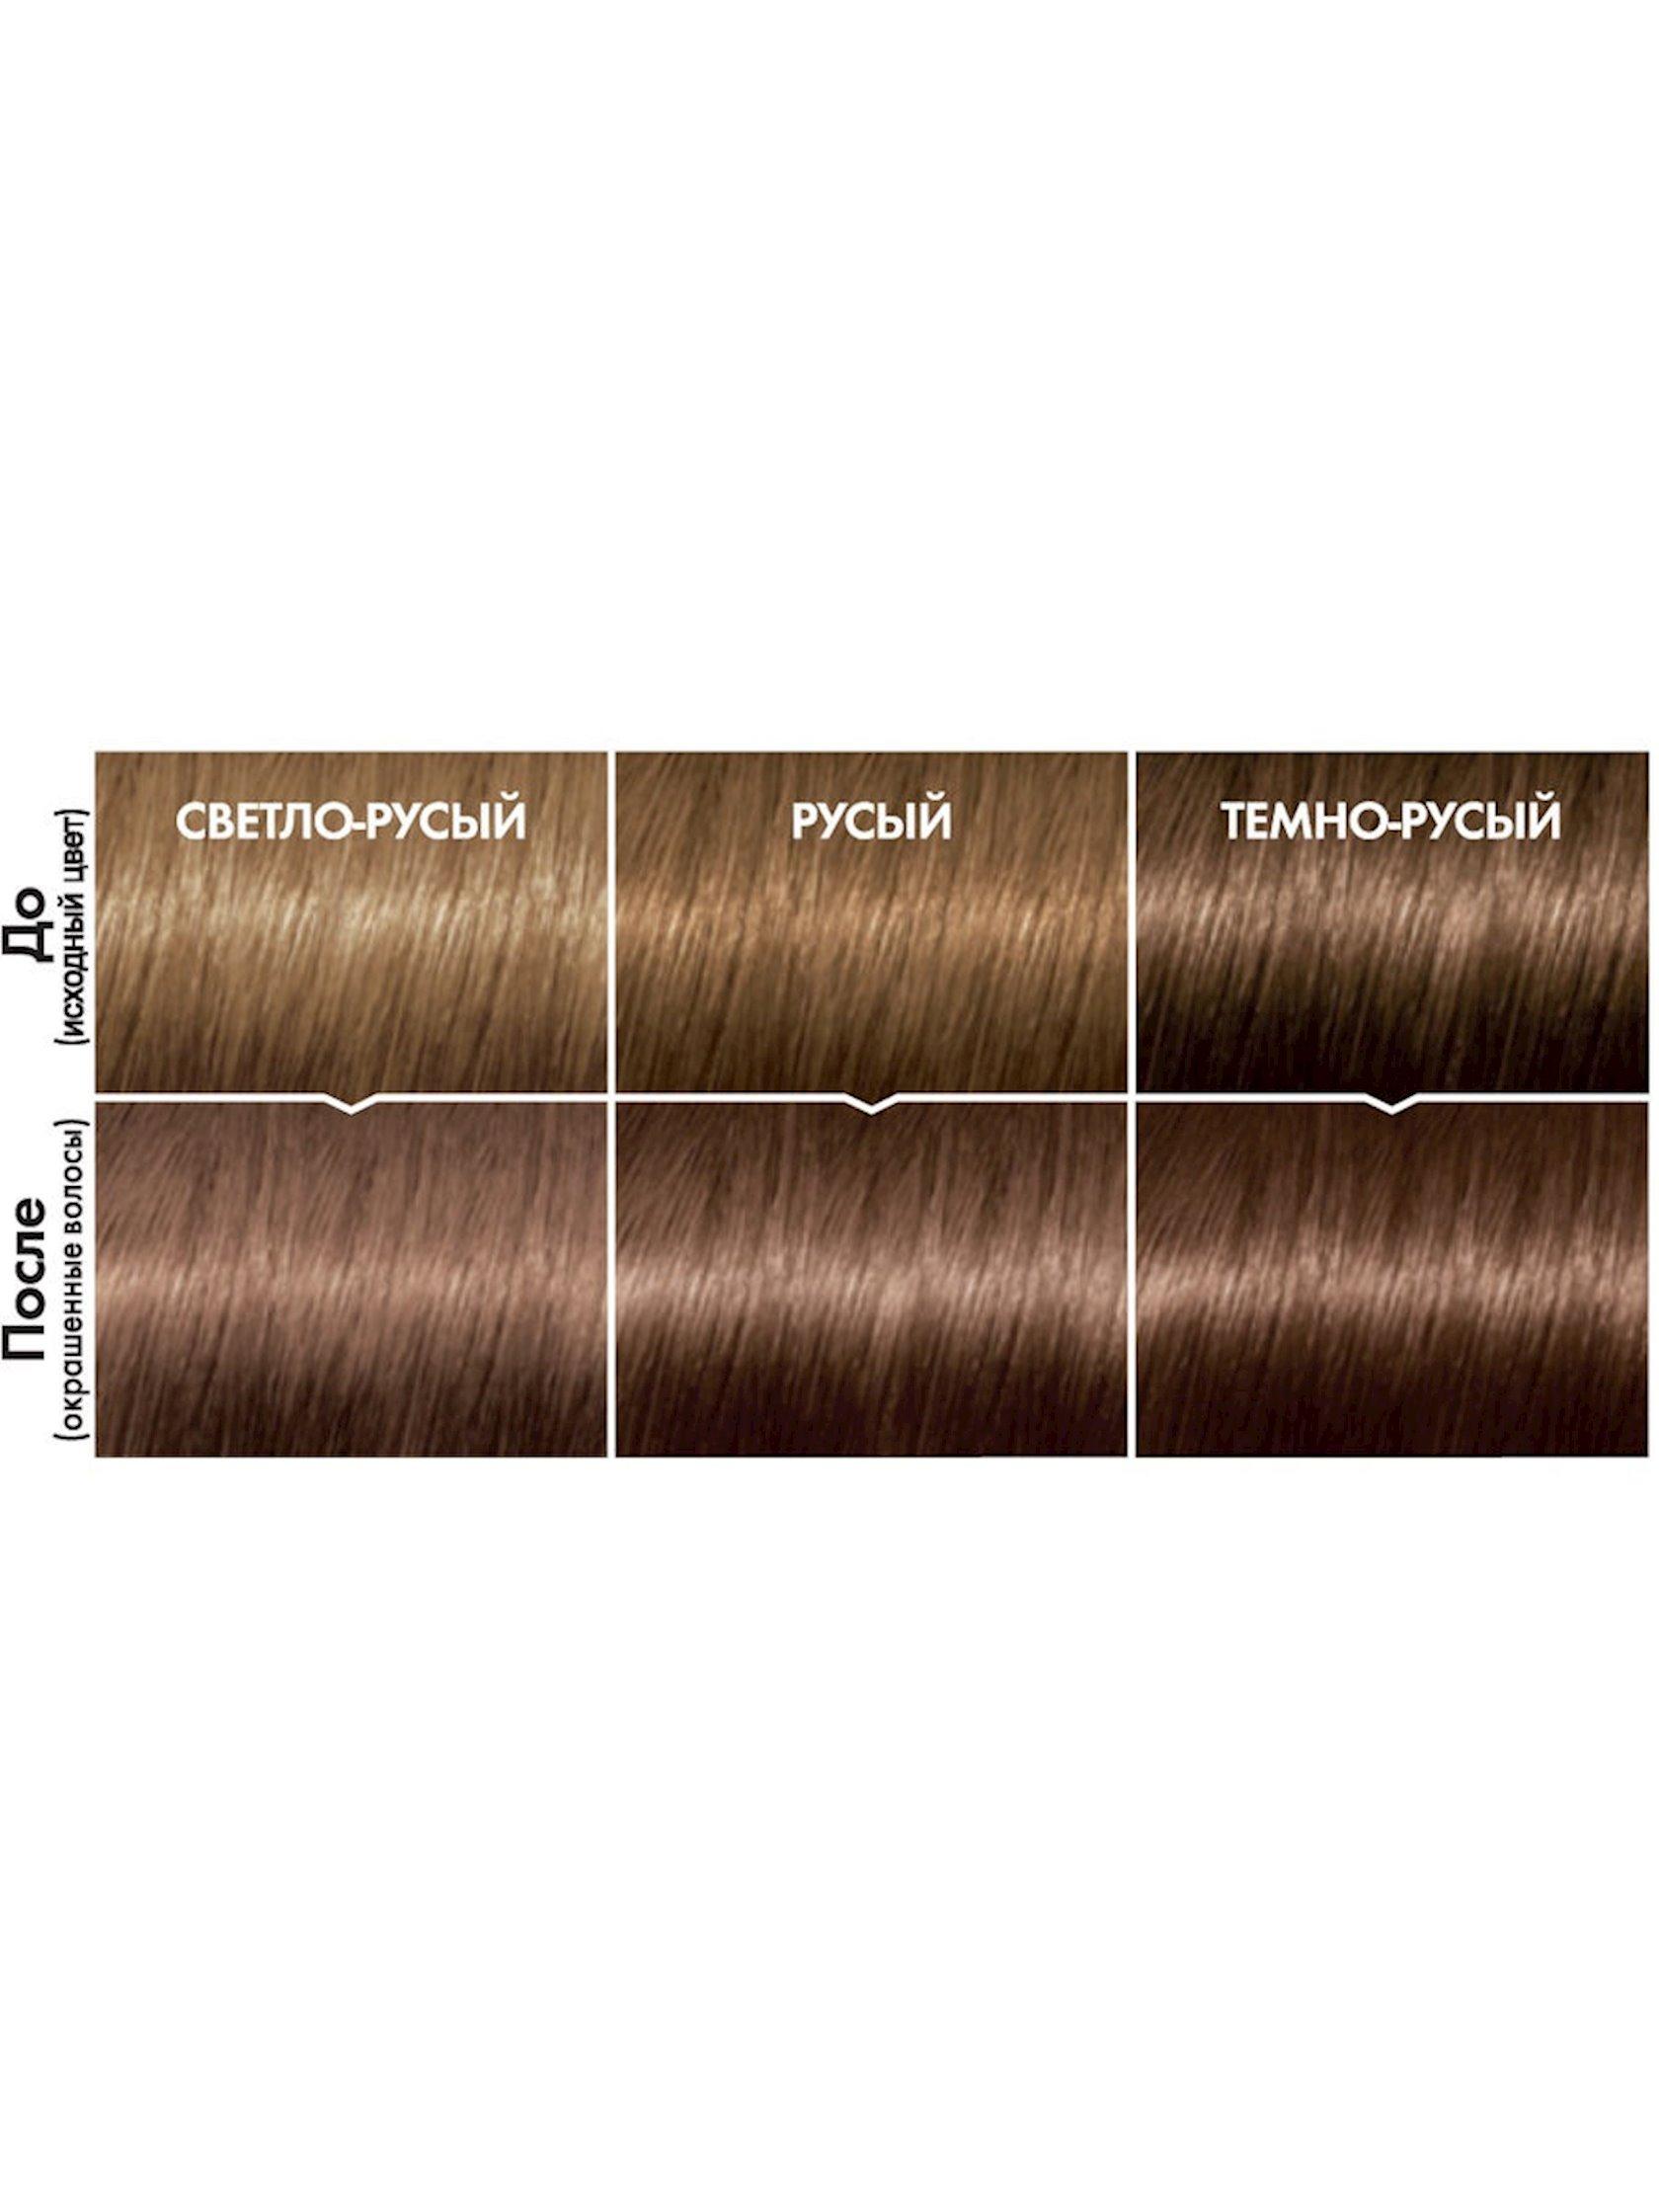 Saç üçün qalıcı krem-boya L'Oreal Paris Casting Creme Gloss ammonyaksız 780 Qozlu mokko